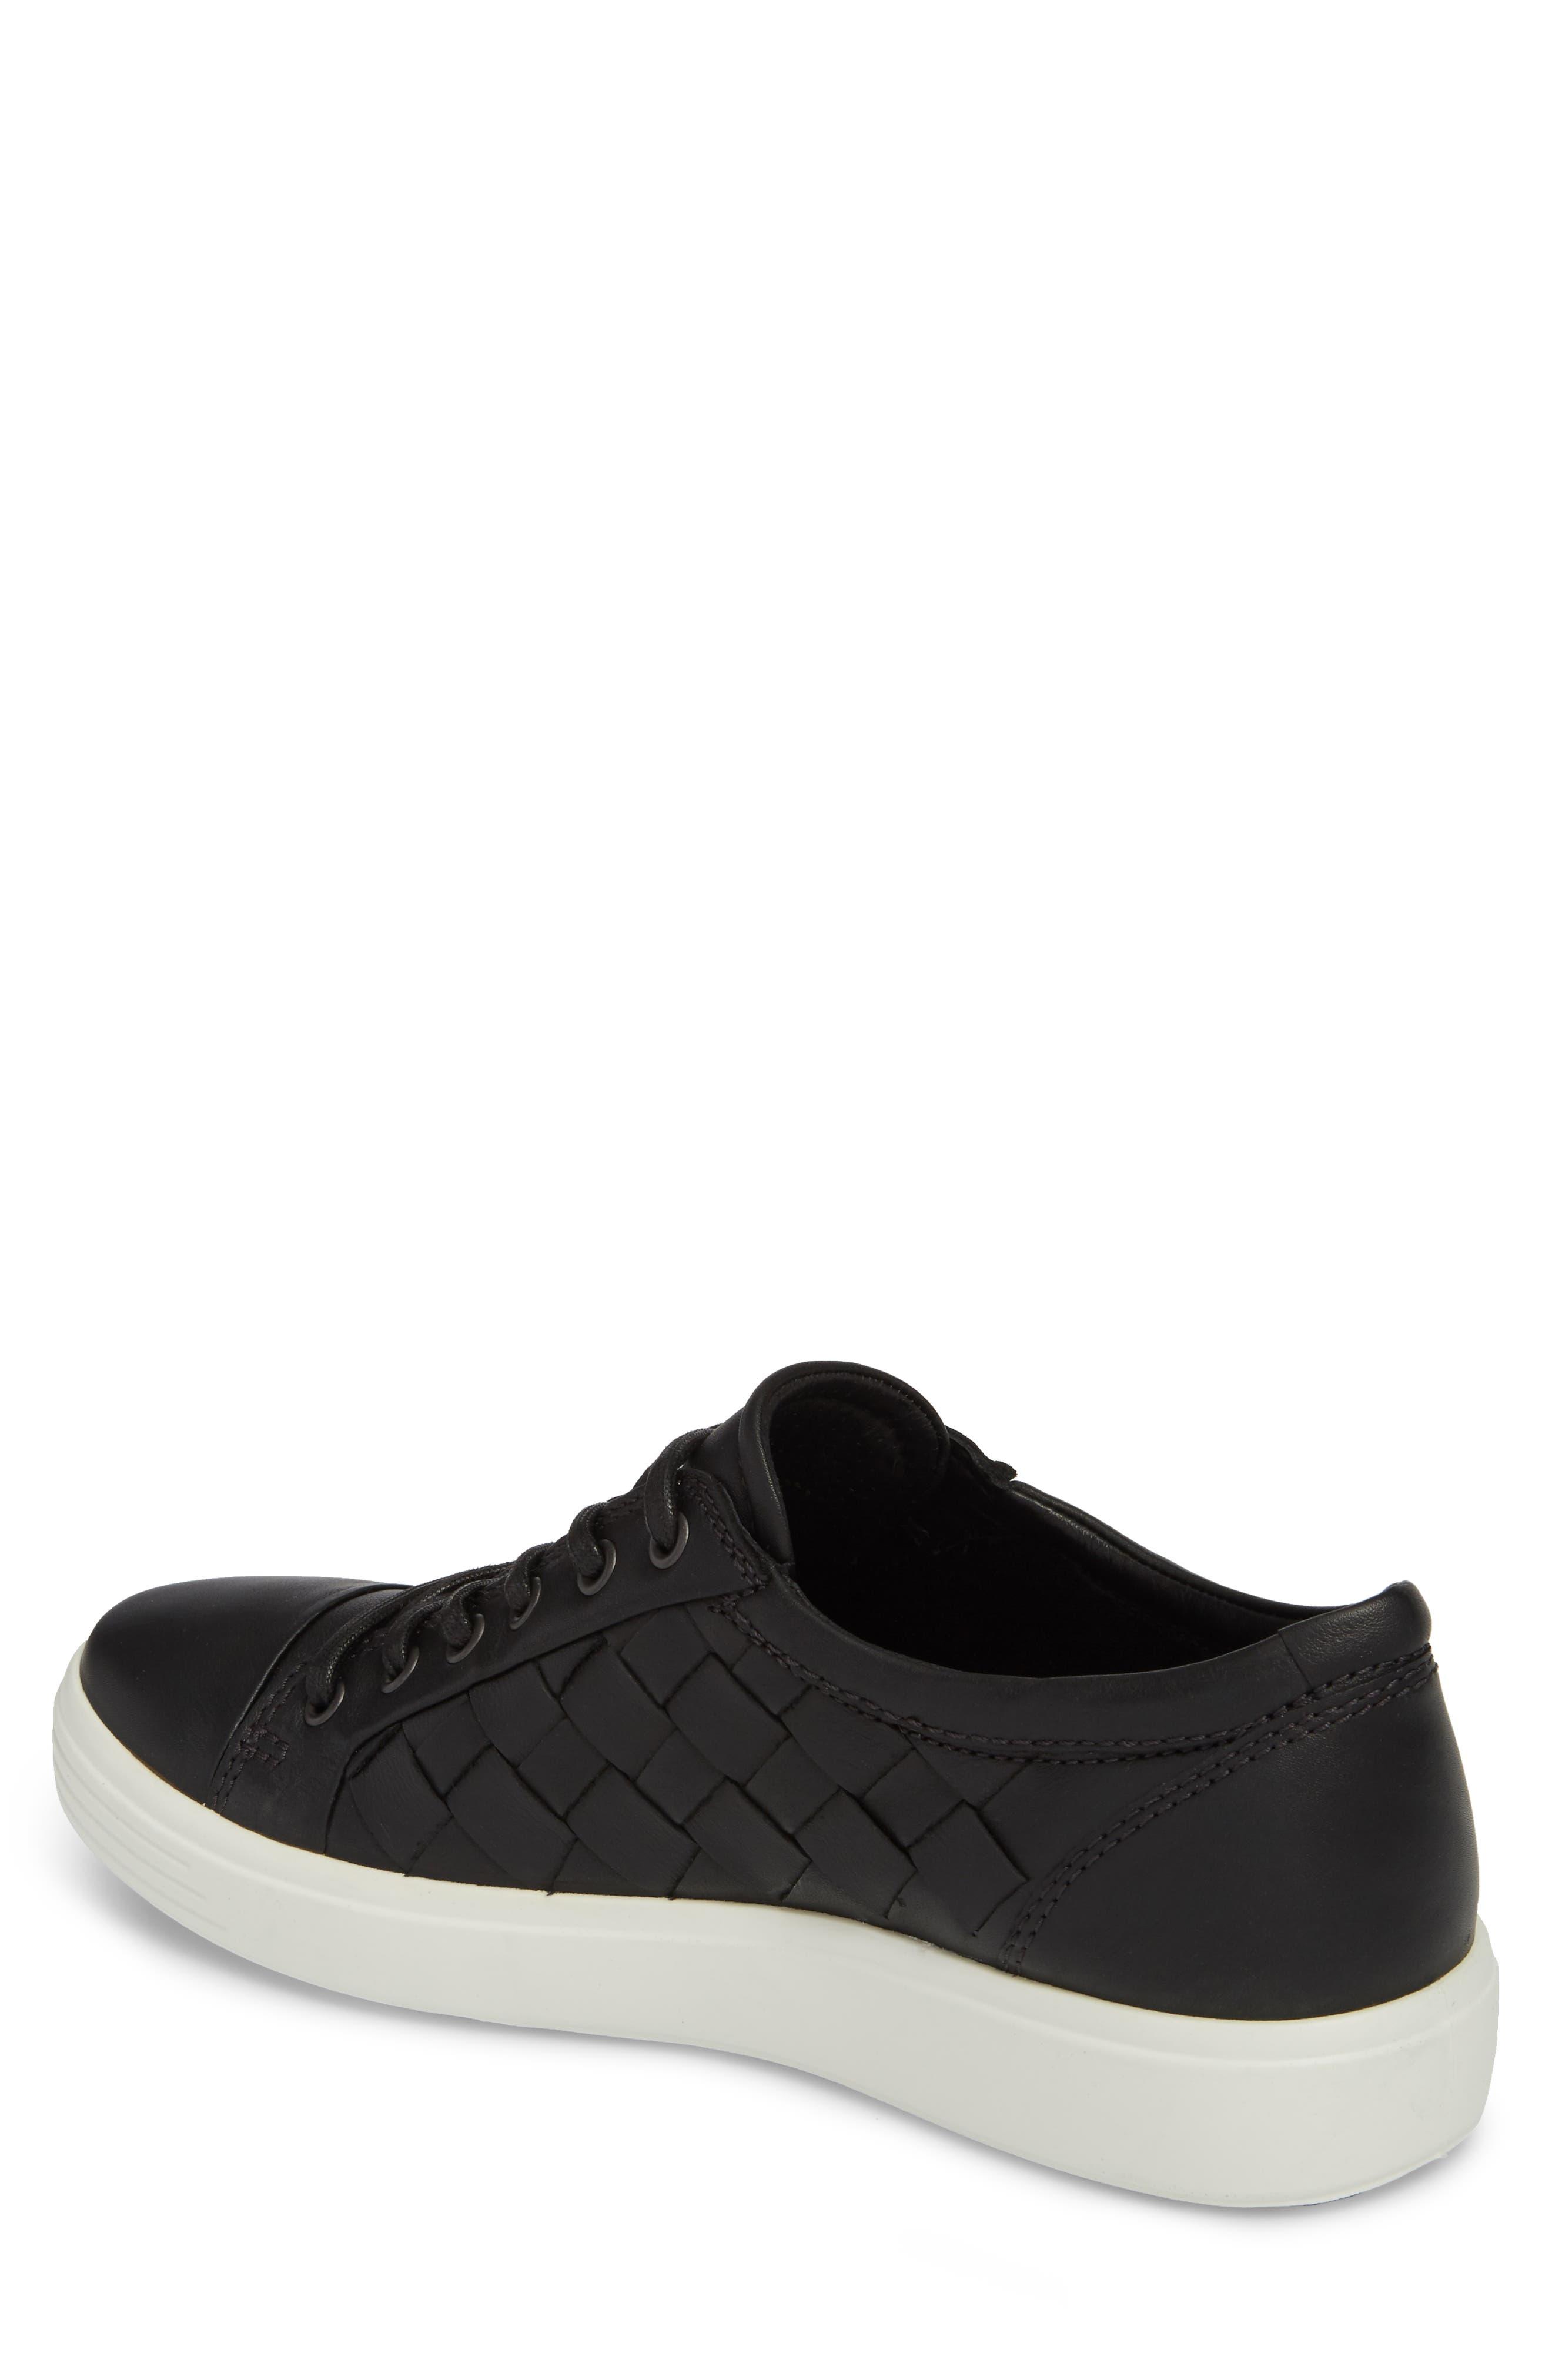 ECCO, Soft 7 Woven Sneaker, Alternate thumbnail 2, color, 009